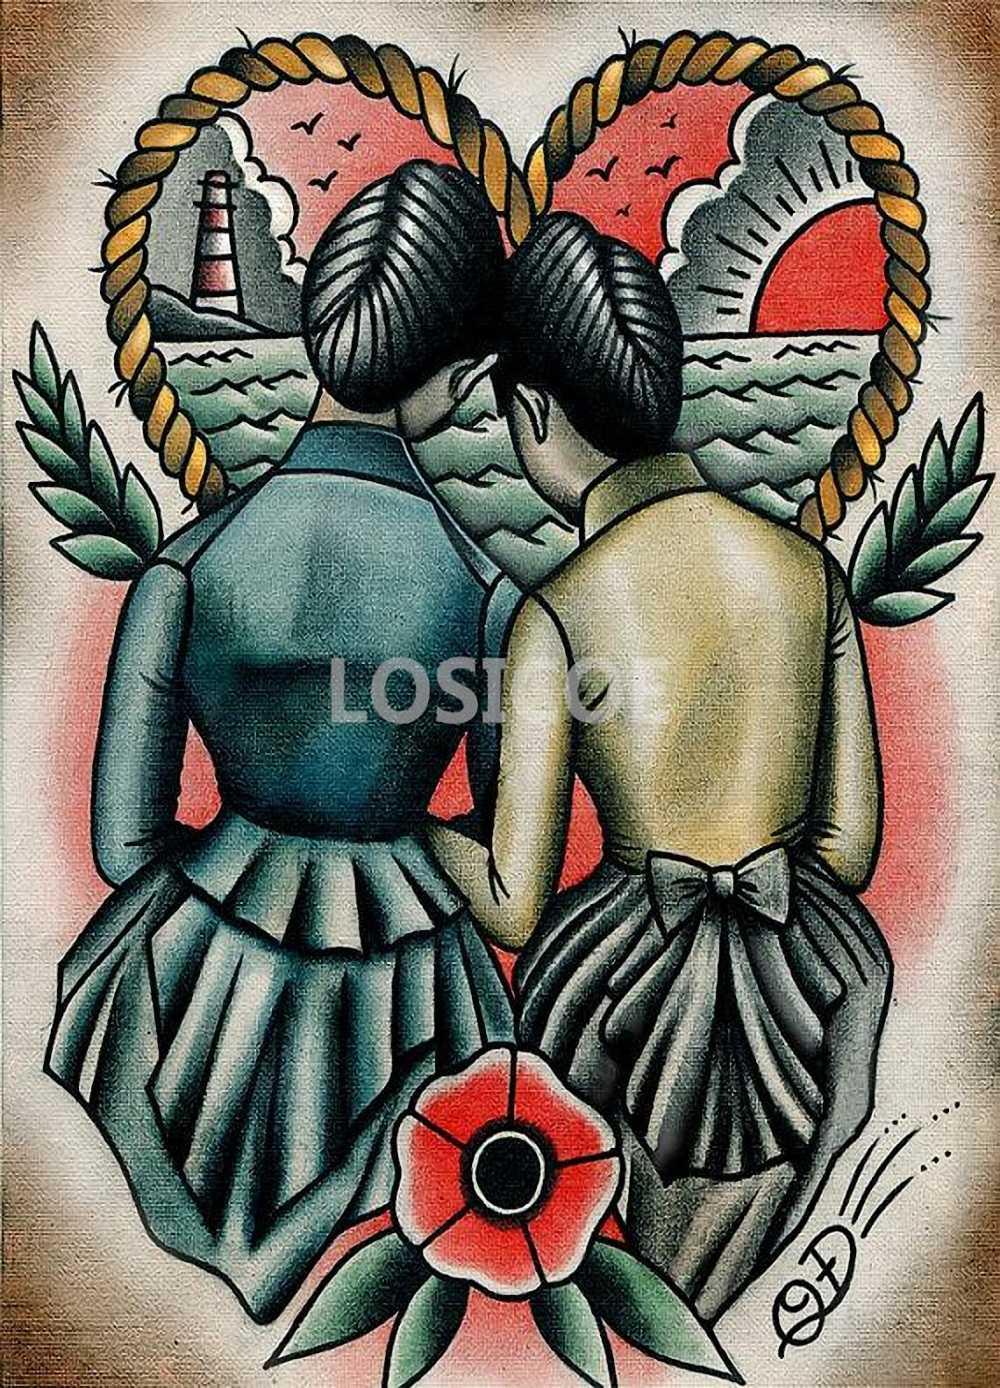 Diseño de tatuaje creativo pósteres pegatina de pared 30X42 CM nostalgia retro papel kraft HD impresión de inyección de tinta arte decoración del hogar b